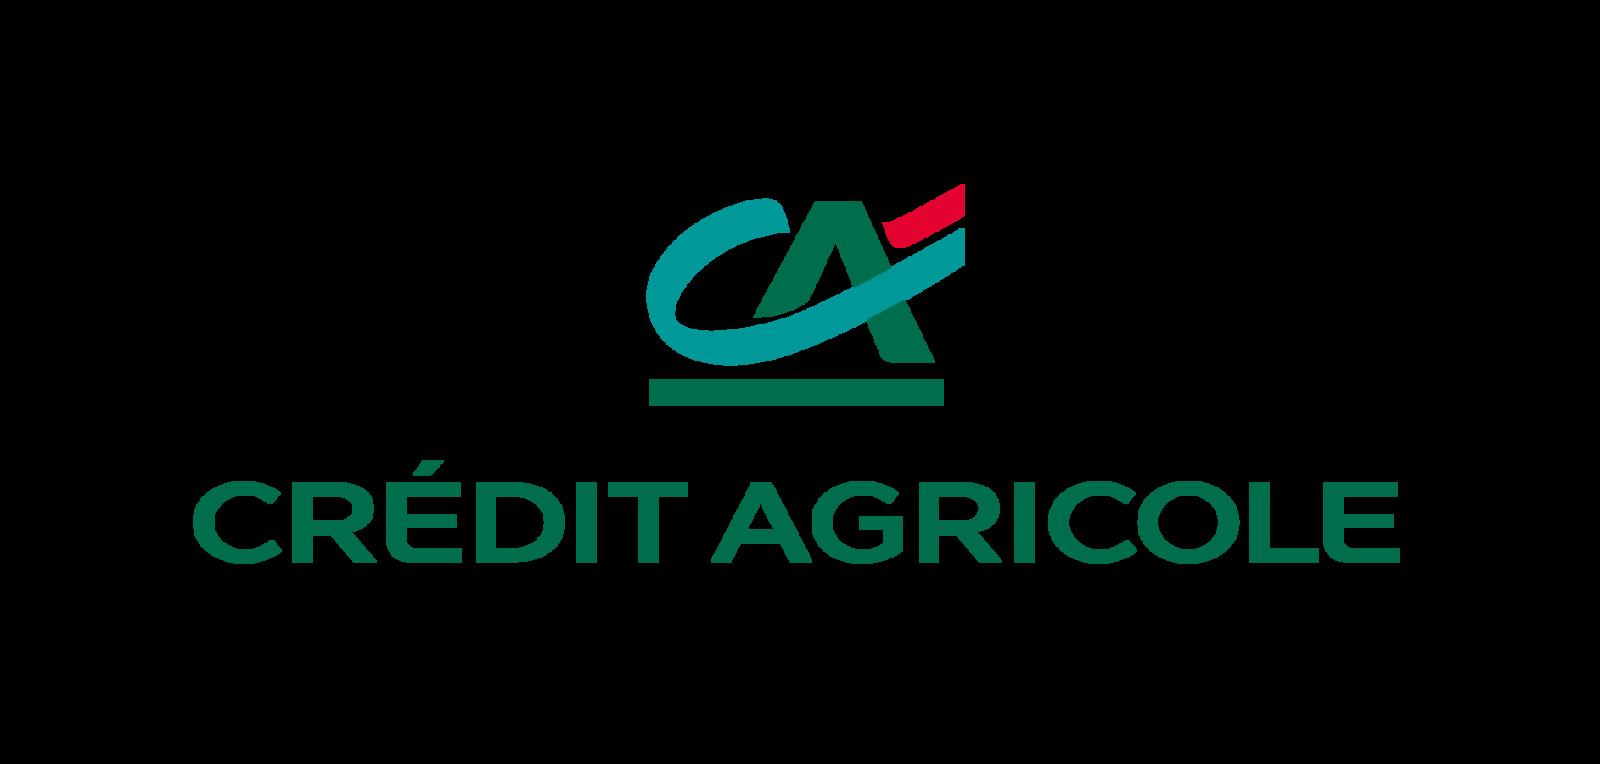 Credit Agricole_1_4